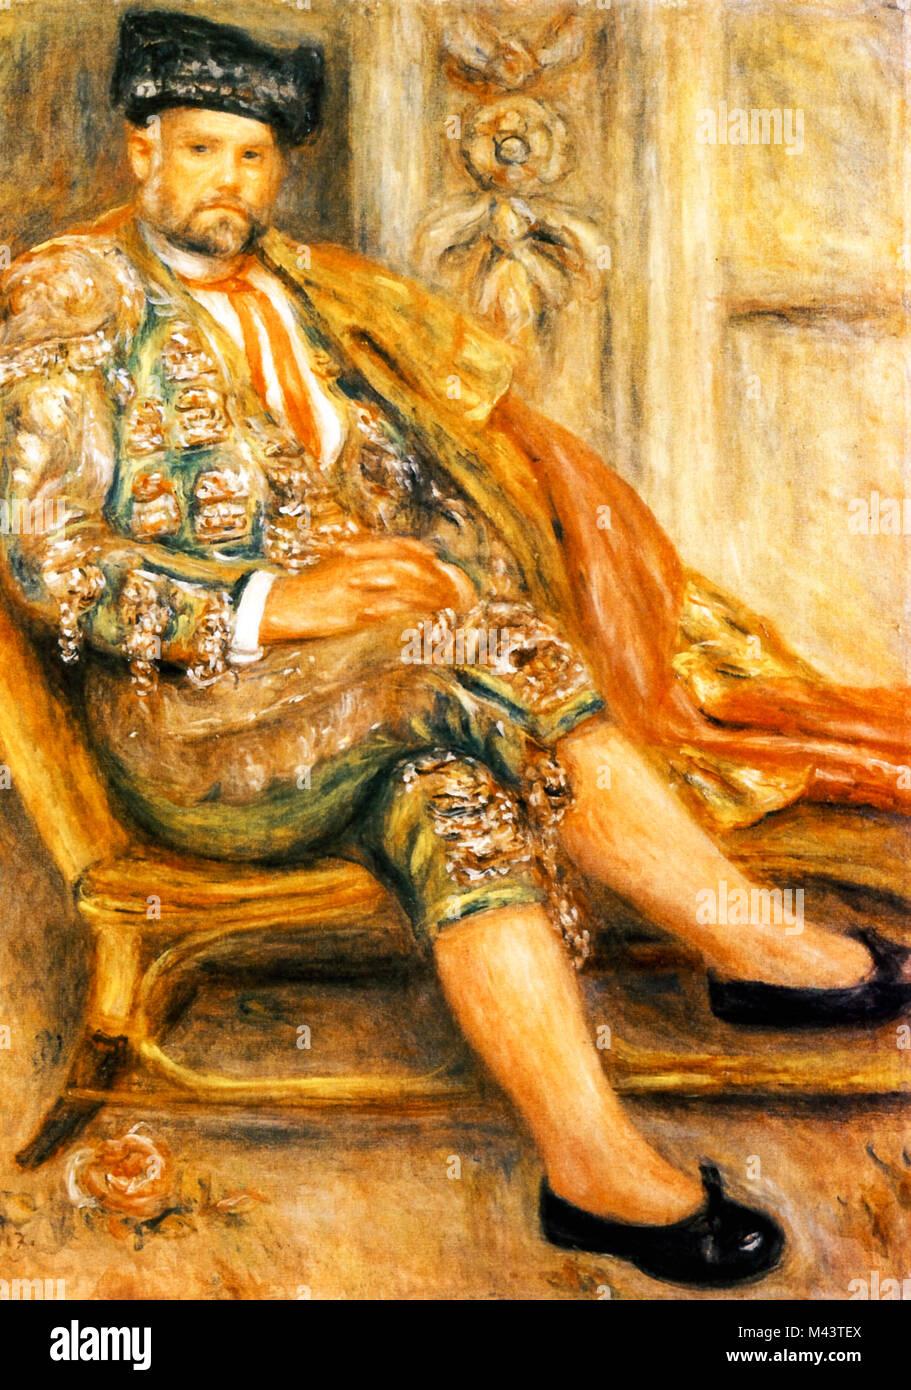 Portrait of Ambroise Vollard, 1917, Renoir - Stock Image